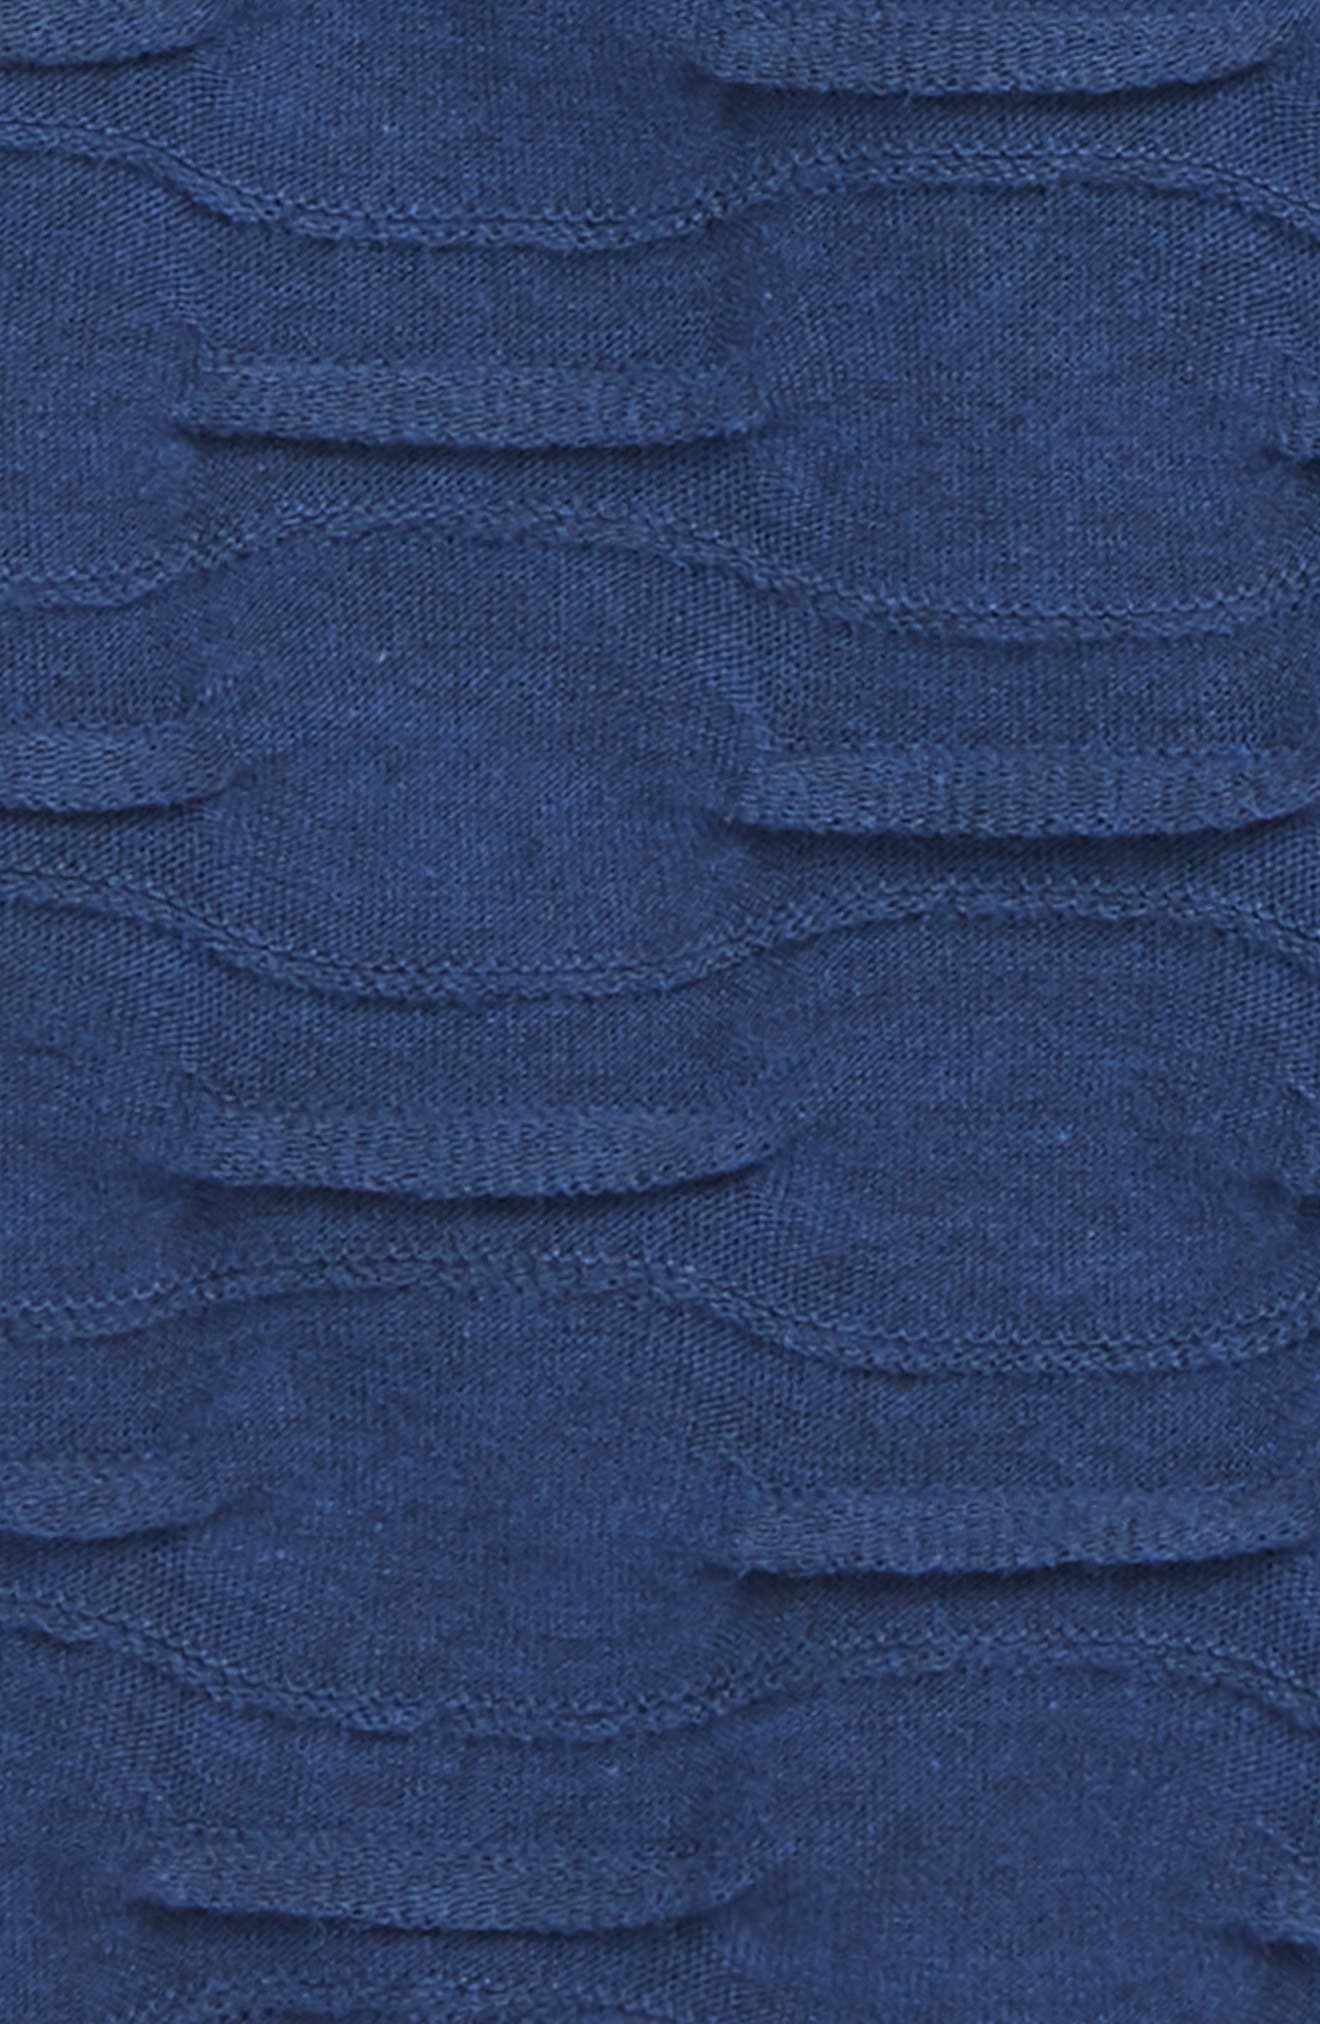 Cambria Shorts,                             Alternate thumbnail 3, color,                             Blue